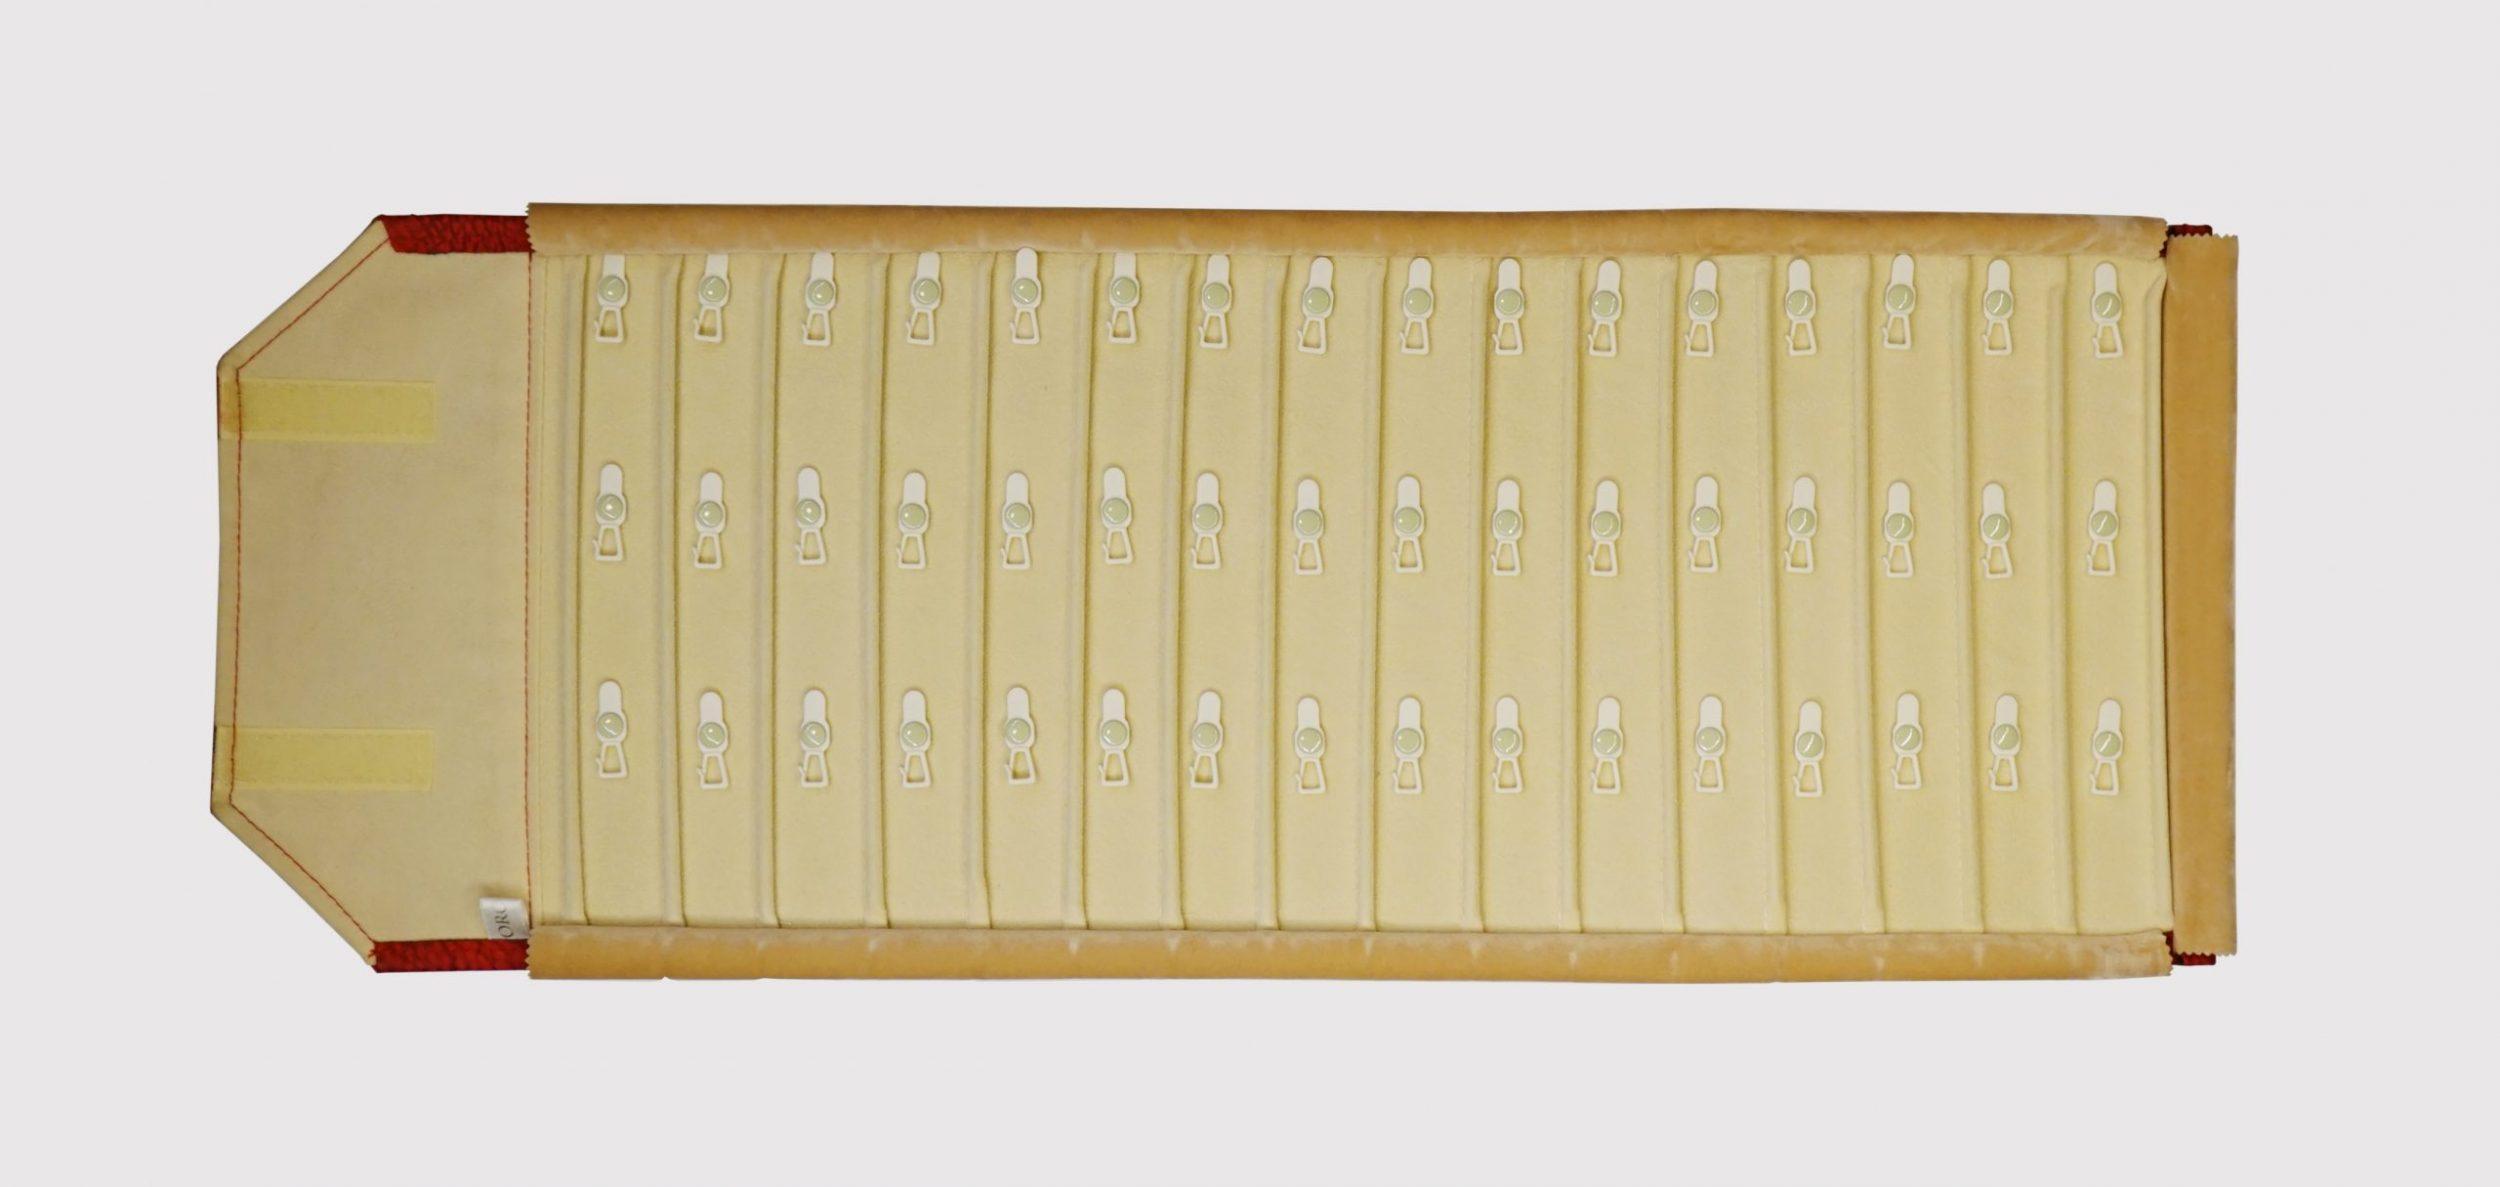 BCR 48 --τετραγωνάκι 3,5 cm x 4 cm--